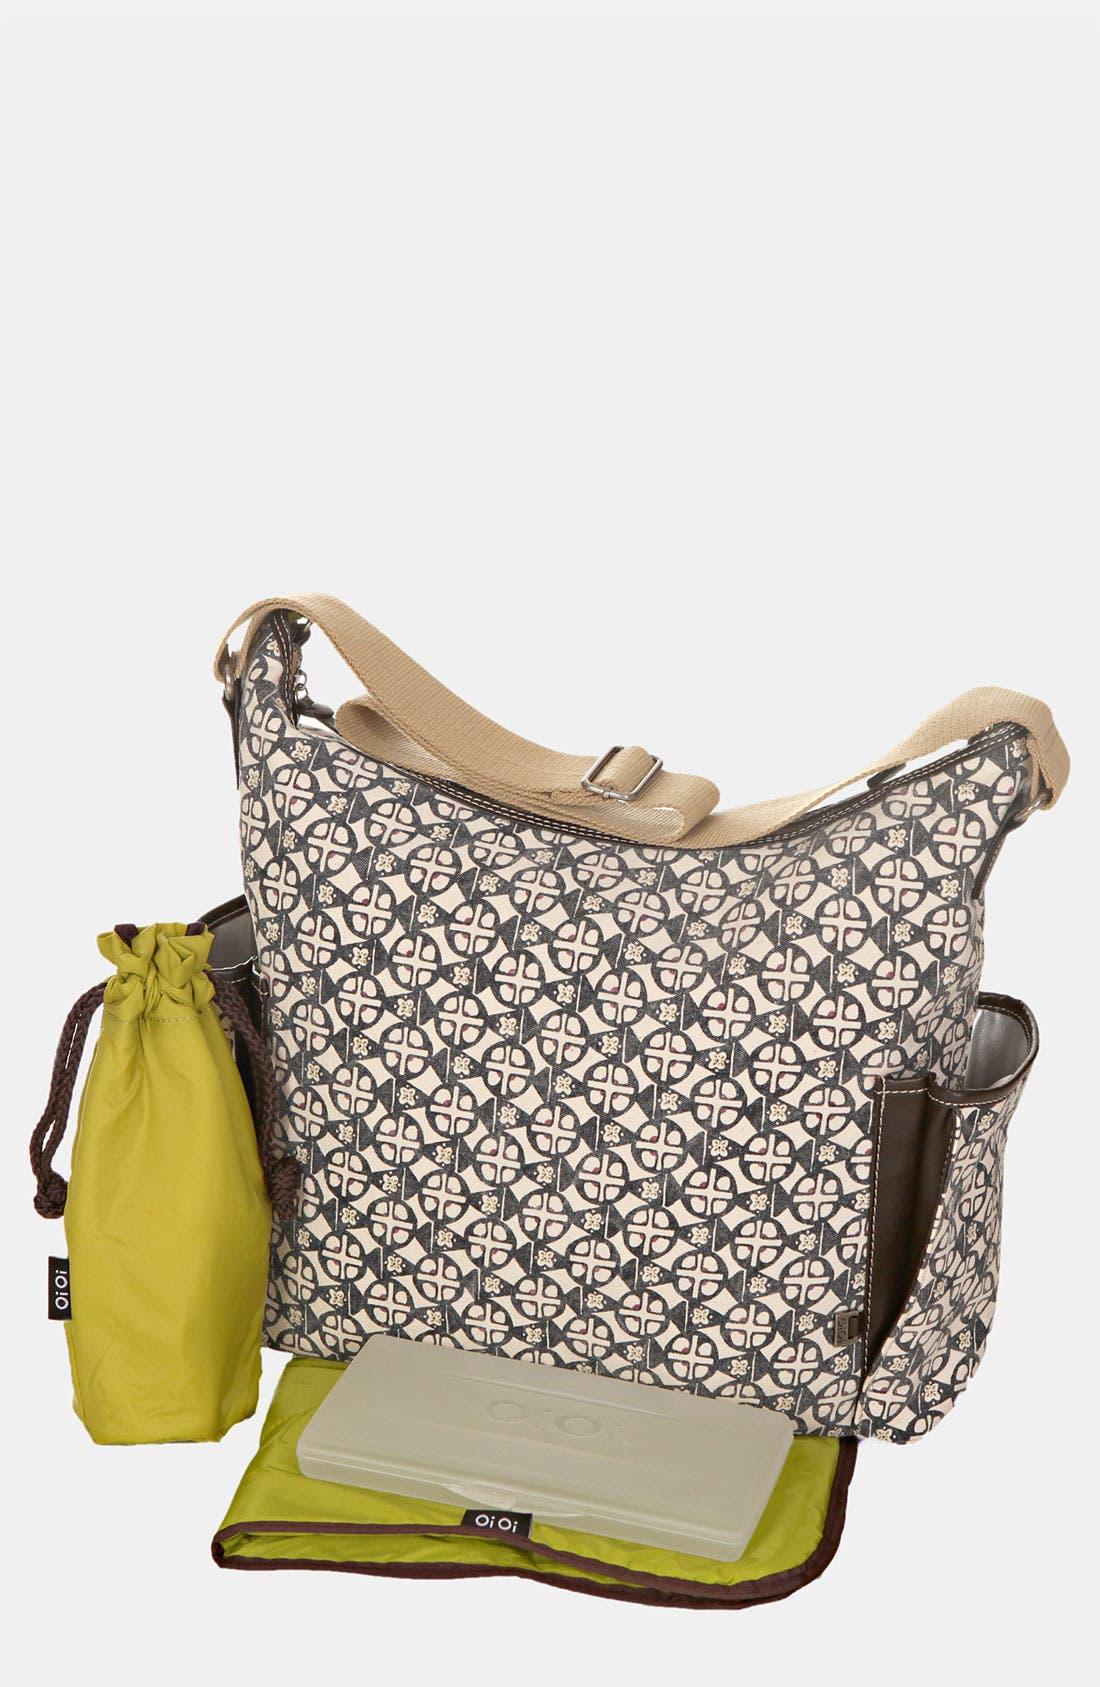 Alternate Image 1 Selected - OiOi 'Safari Medallion' Diaper Bag